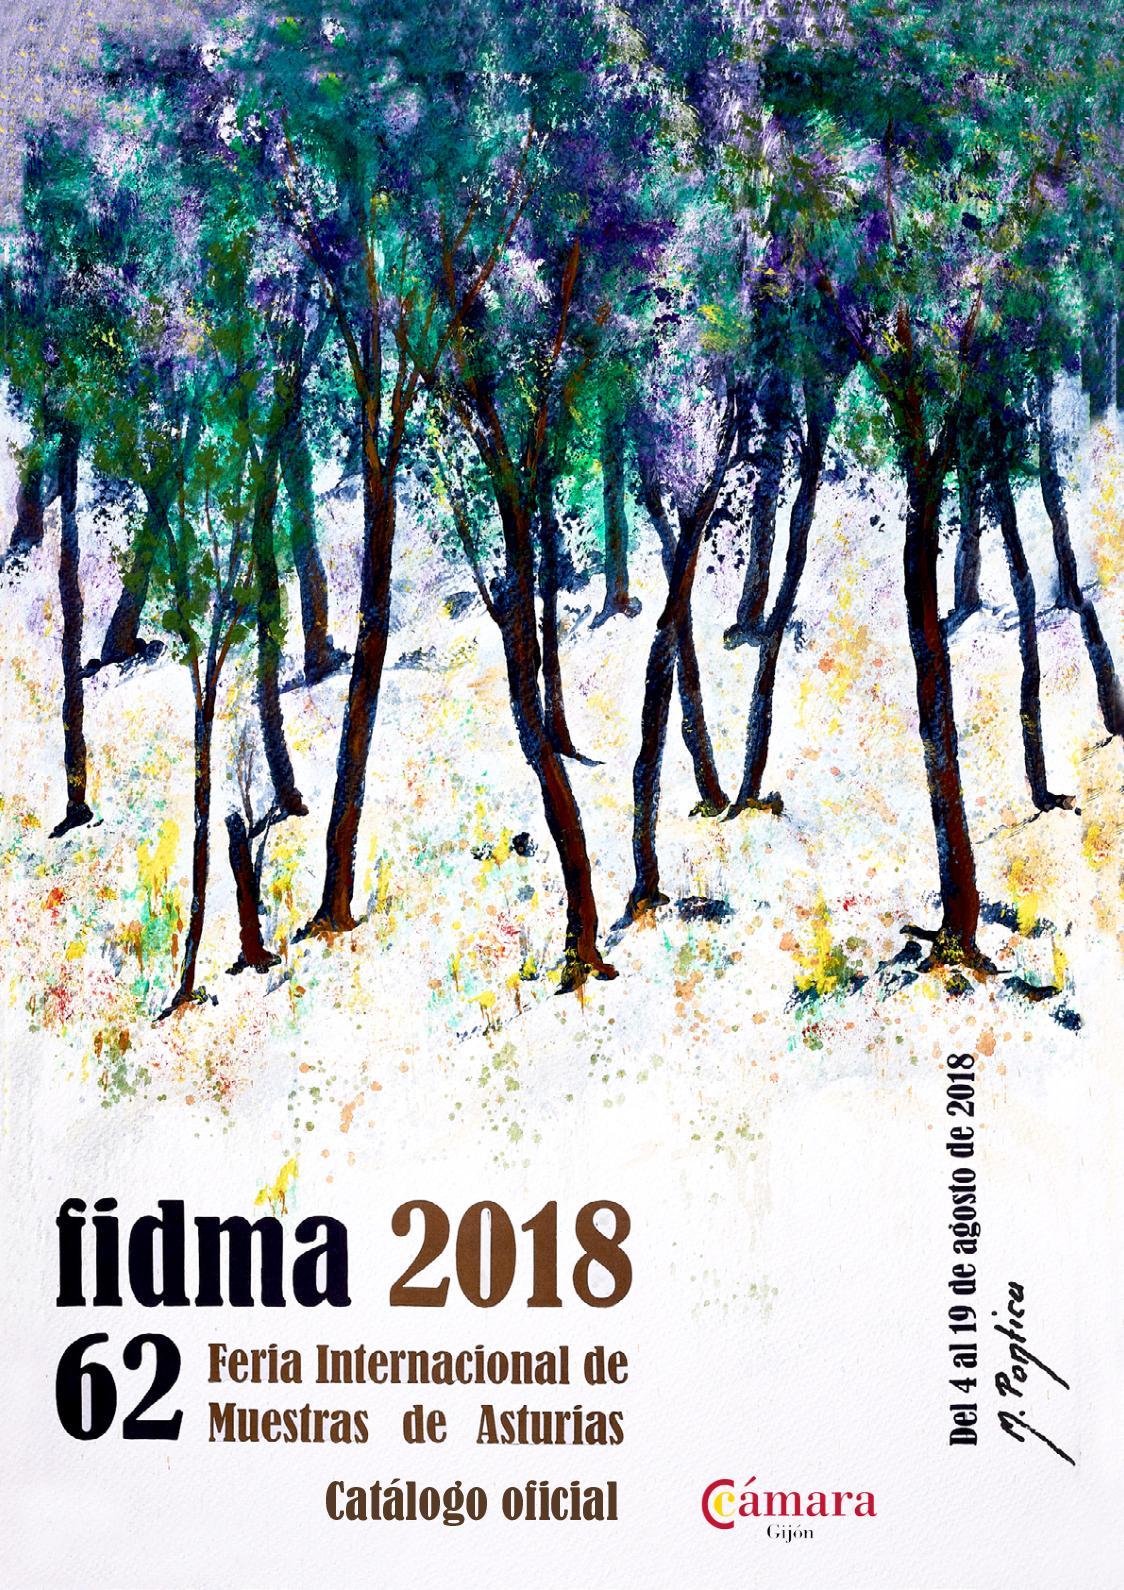 e506eafb80f0 FIDMA 2018 - CALAMEO Downloader